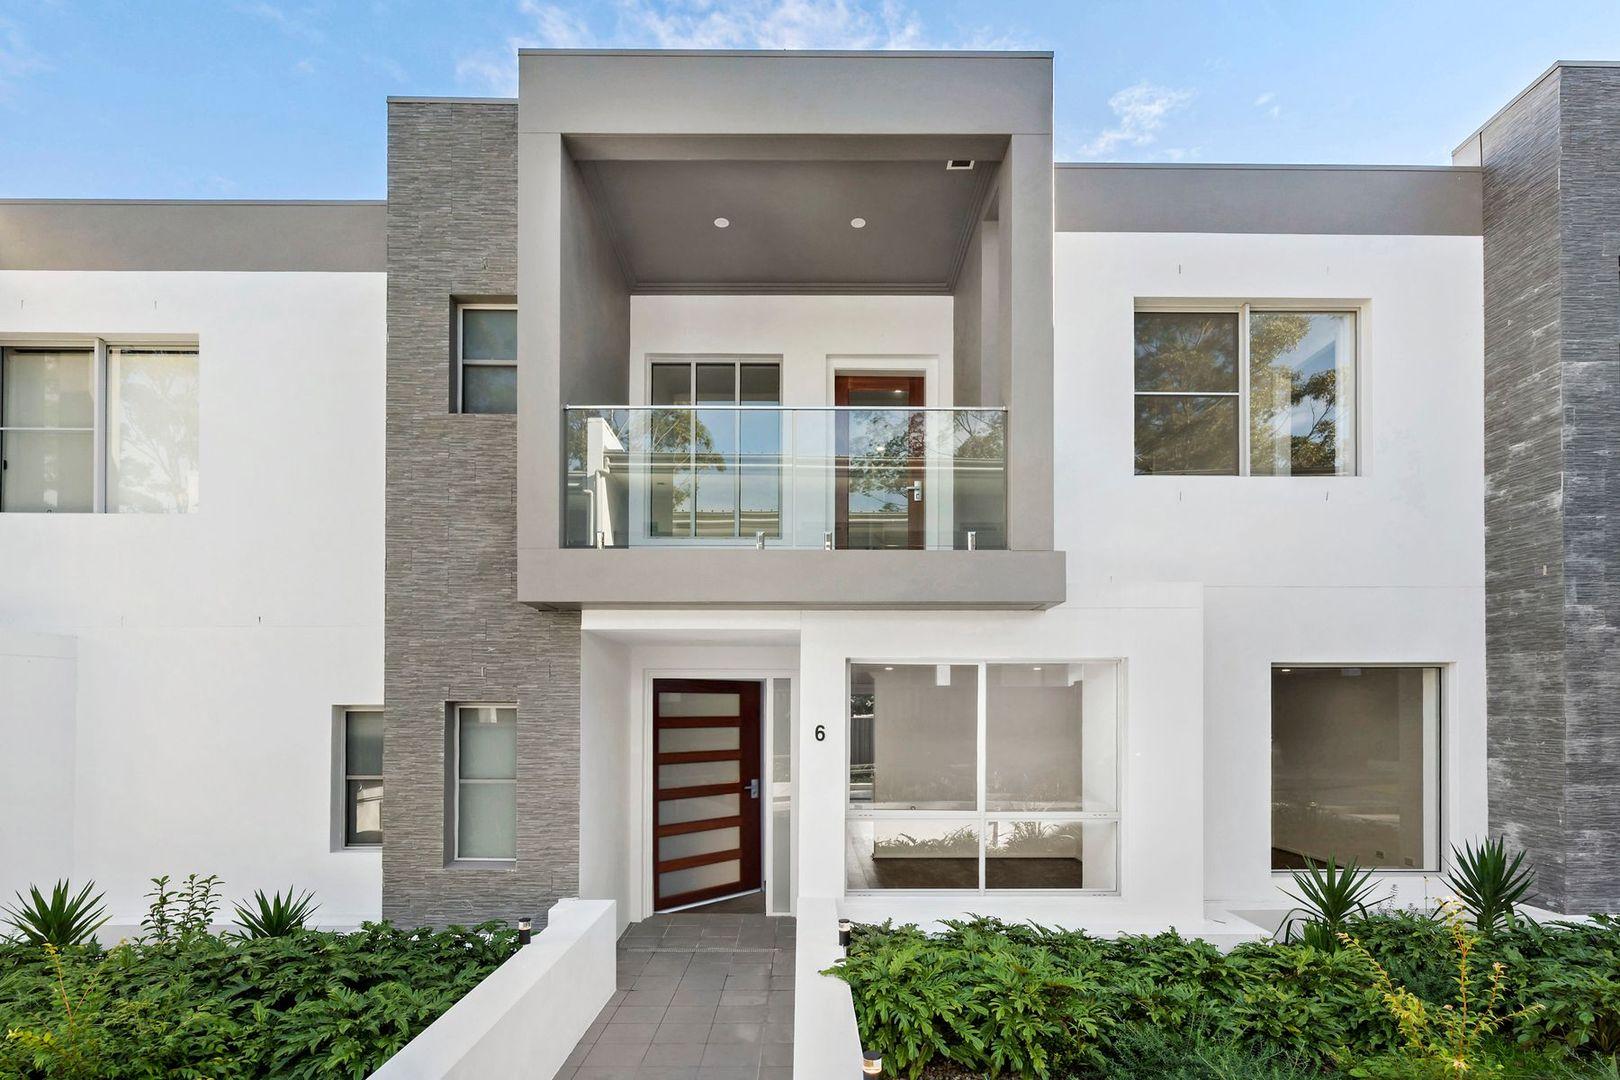 6/12 Willandra Street, Lane Cove North NSW 2066, Image 0